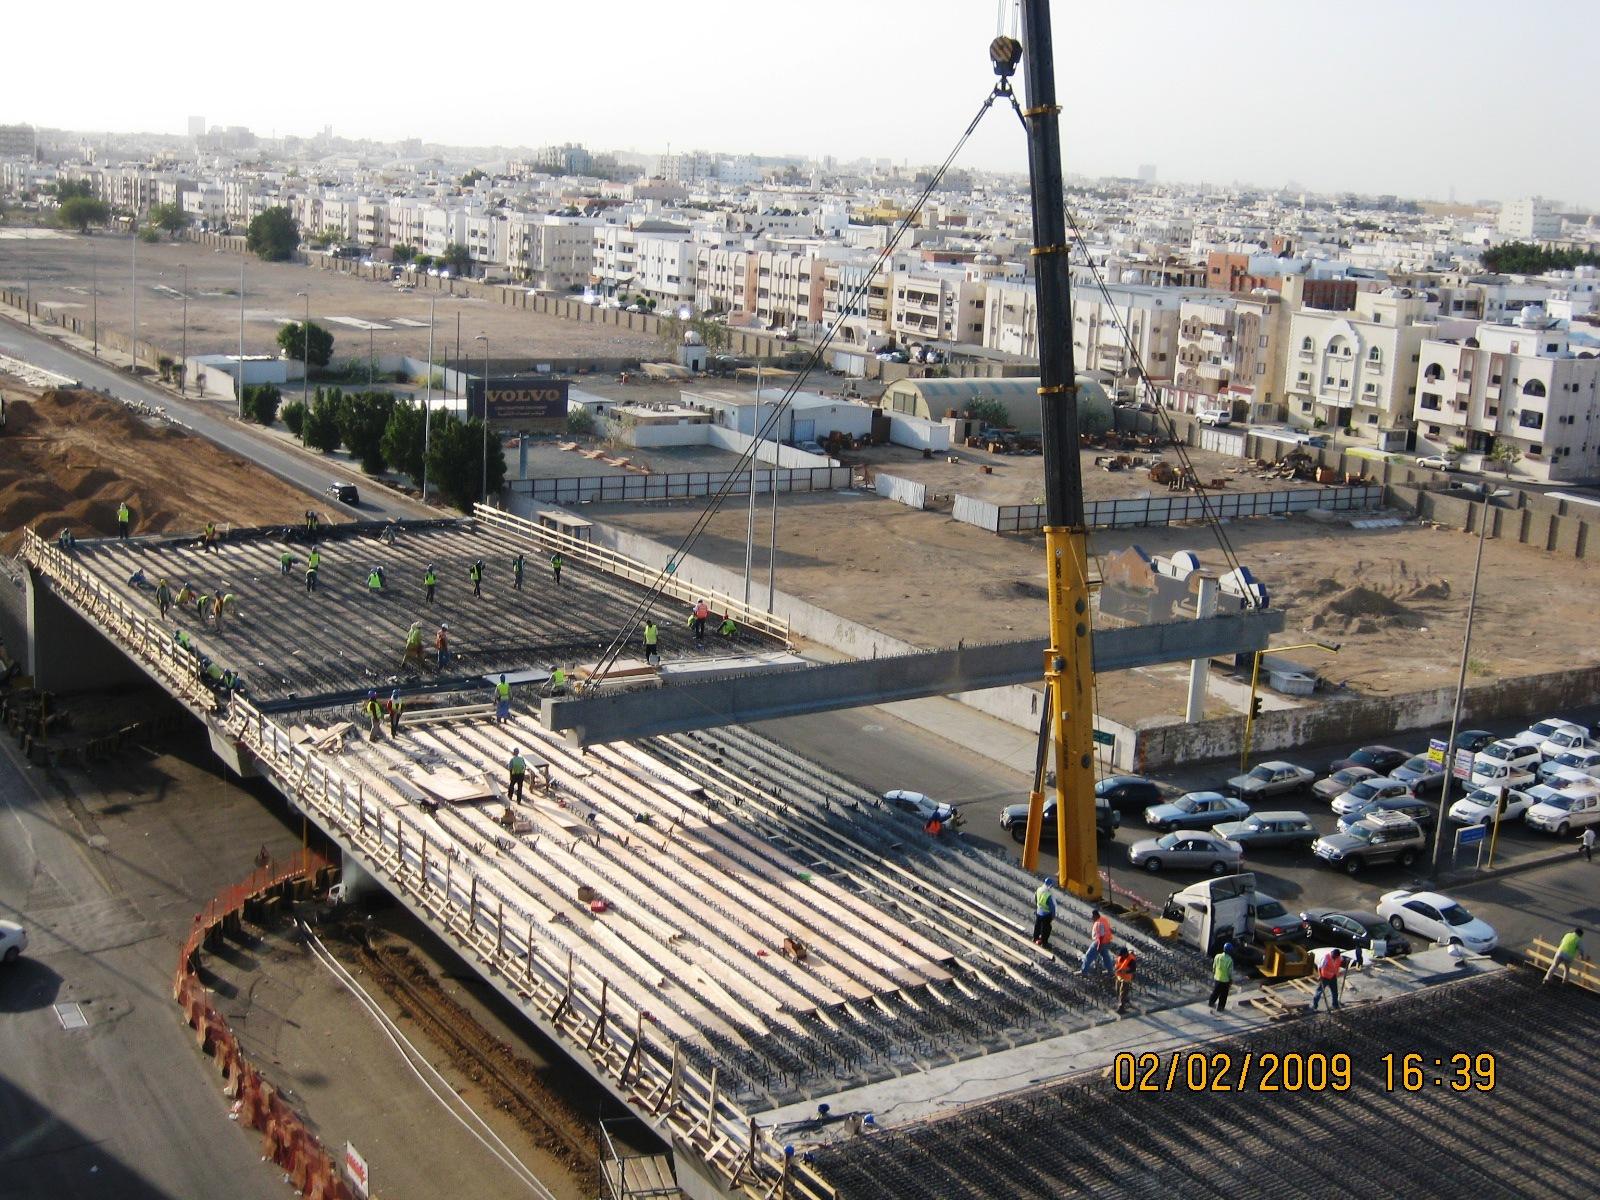 Bridge of Pr Mutaib St with Pr. Mohd. Abdul Aziz St – Jeddah